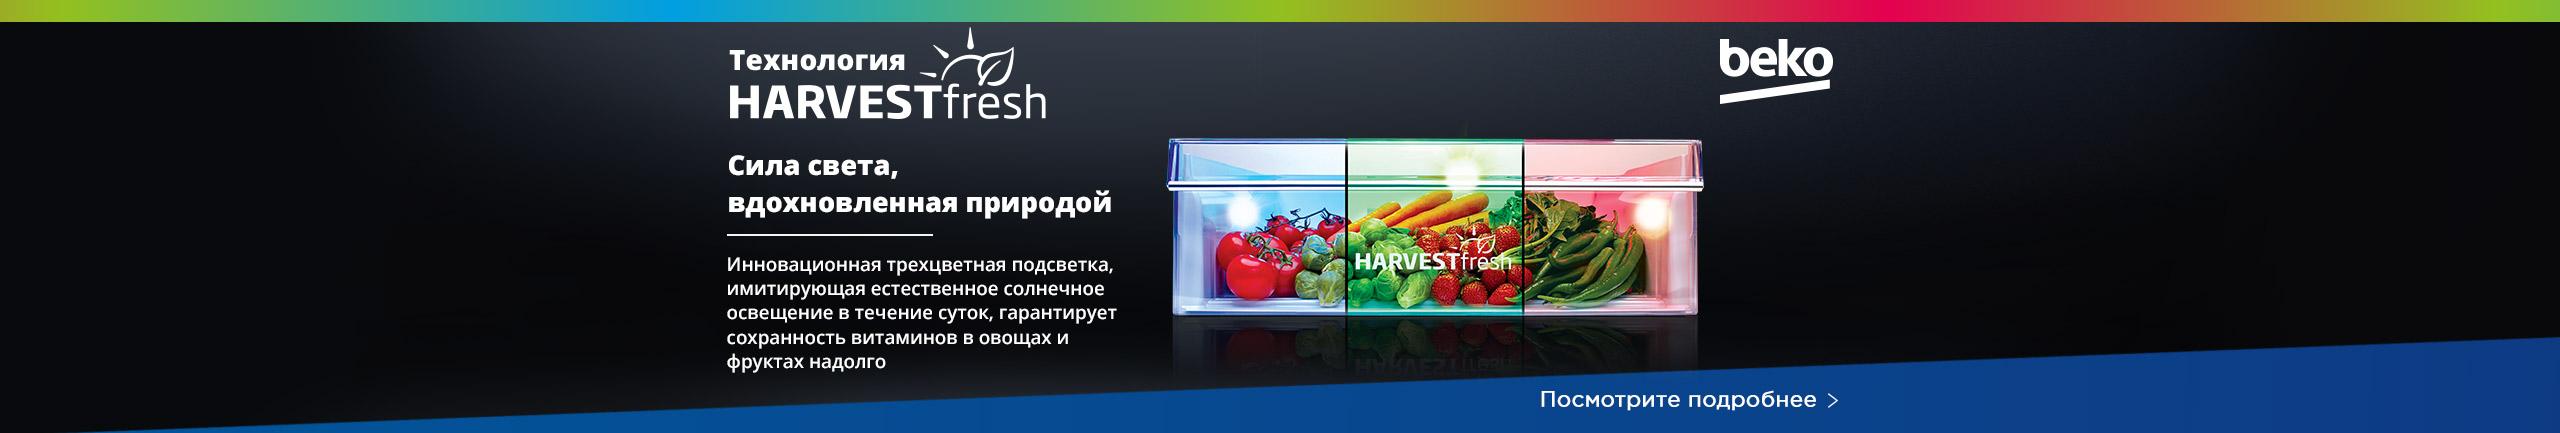 Beko HarvestFresh